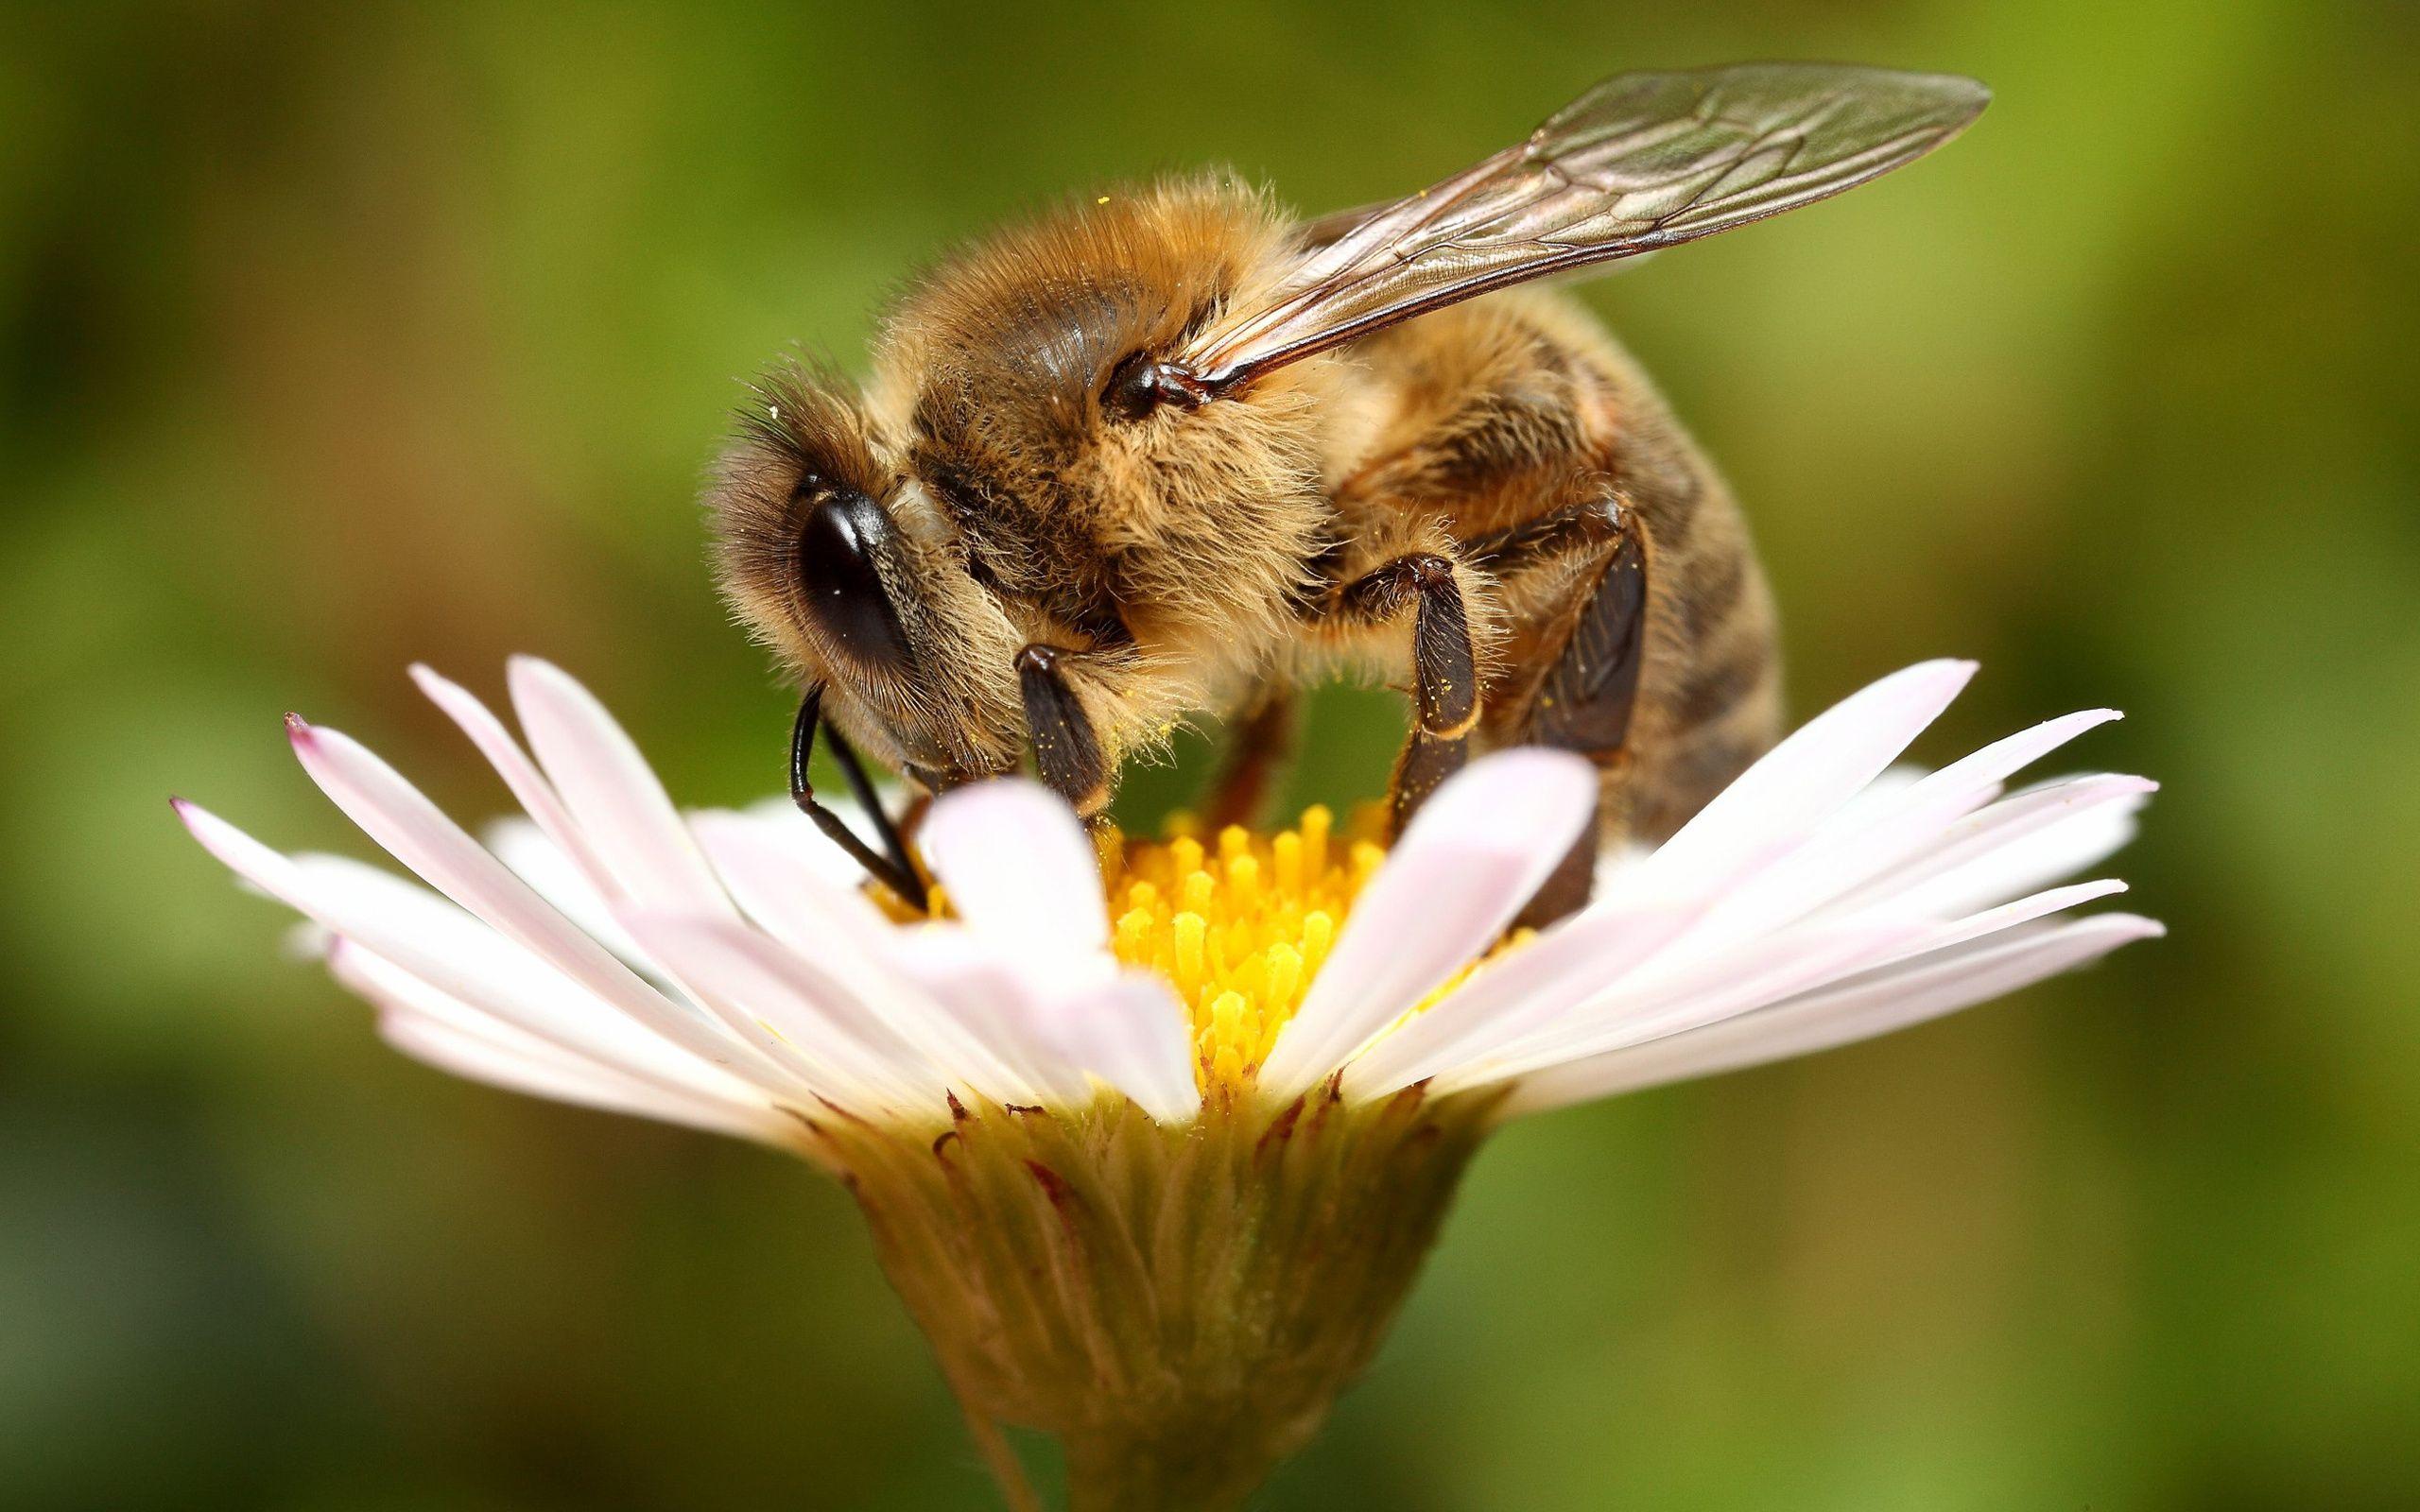 Honey Bee Desktop Wallpaper WallpaperSafari Margaridas